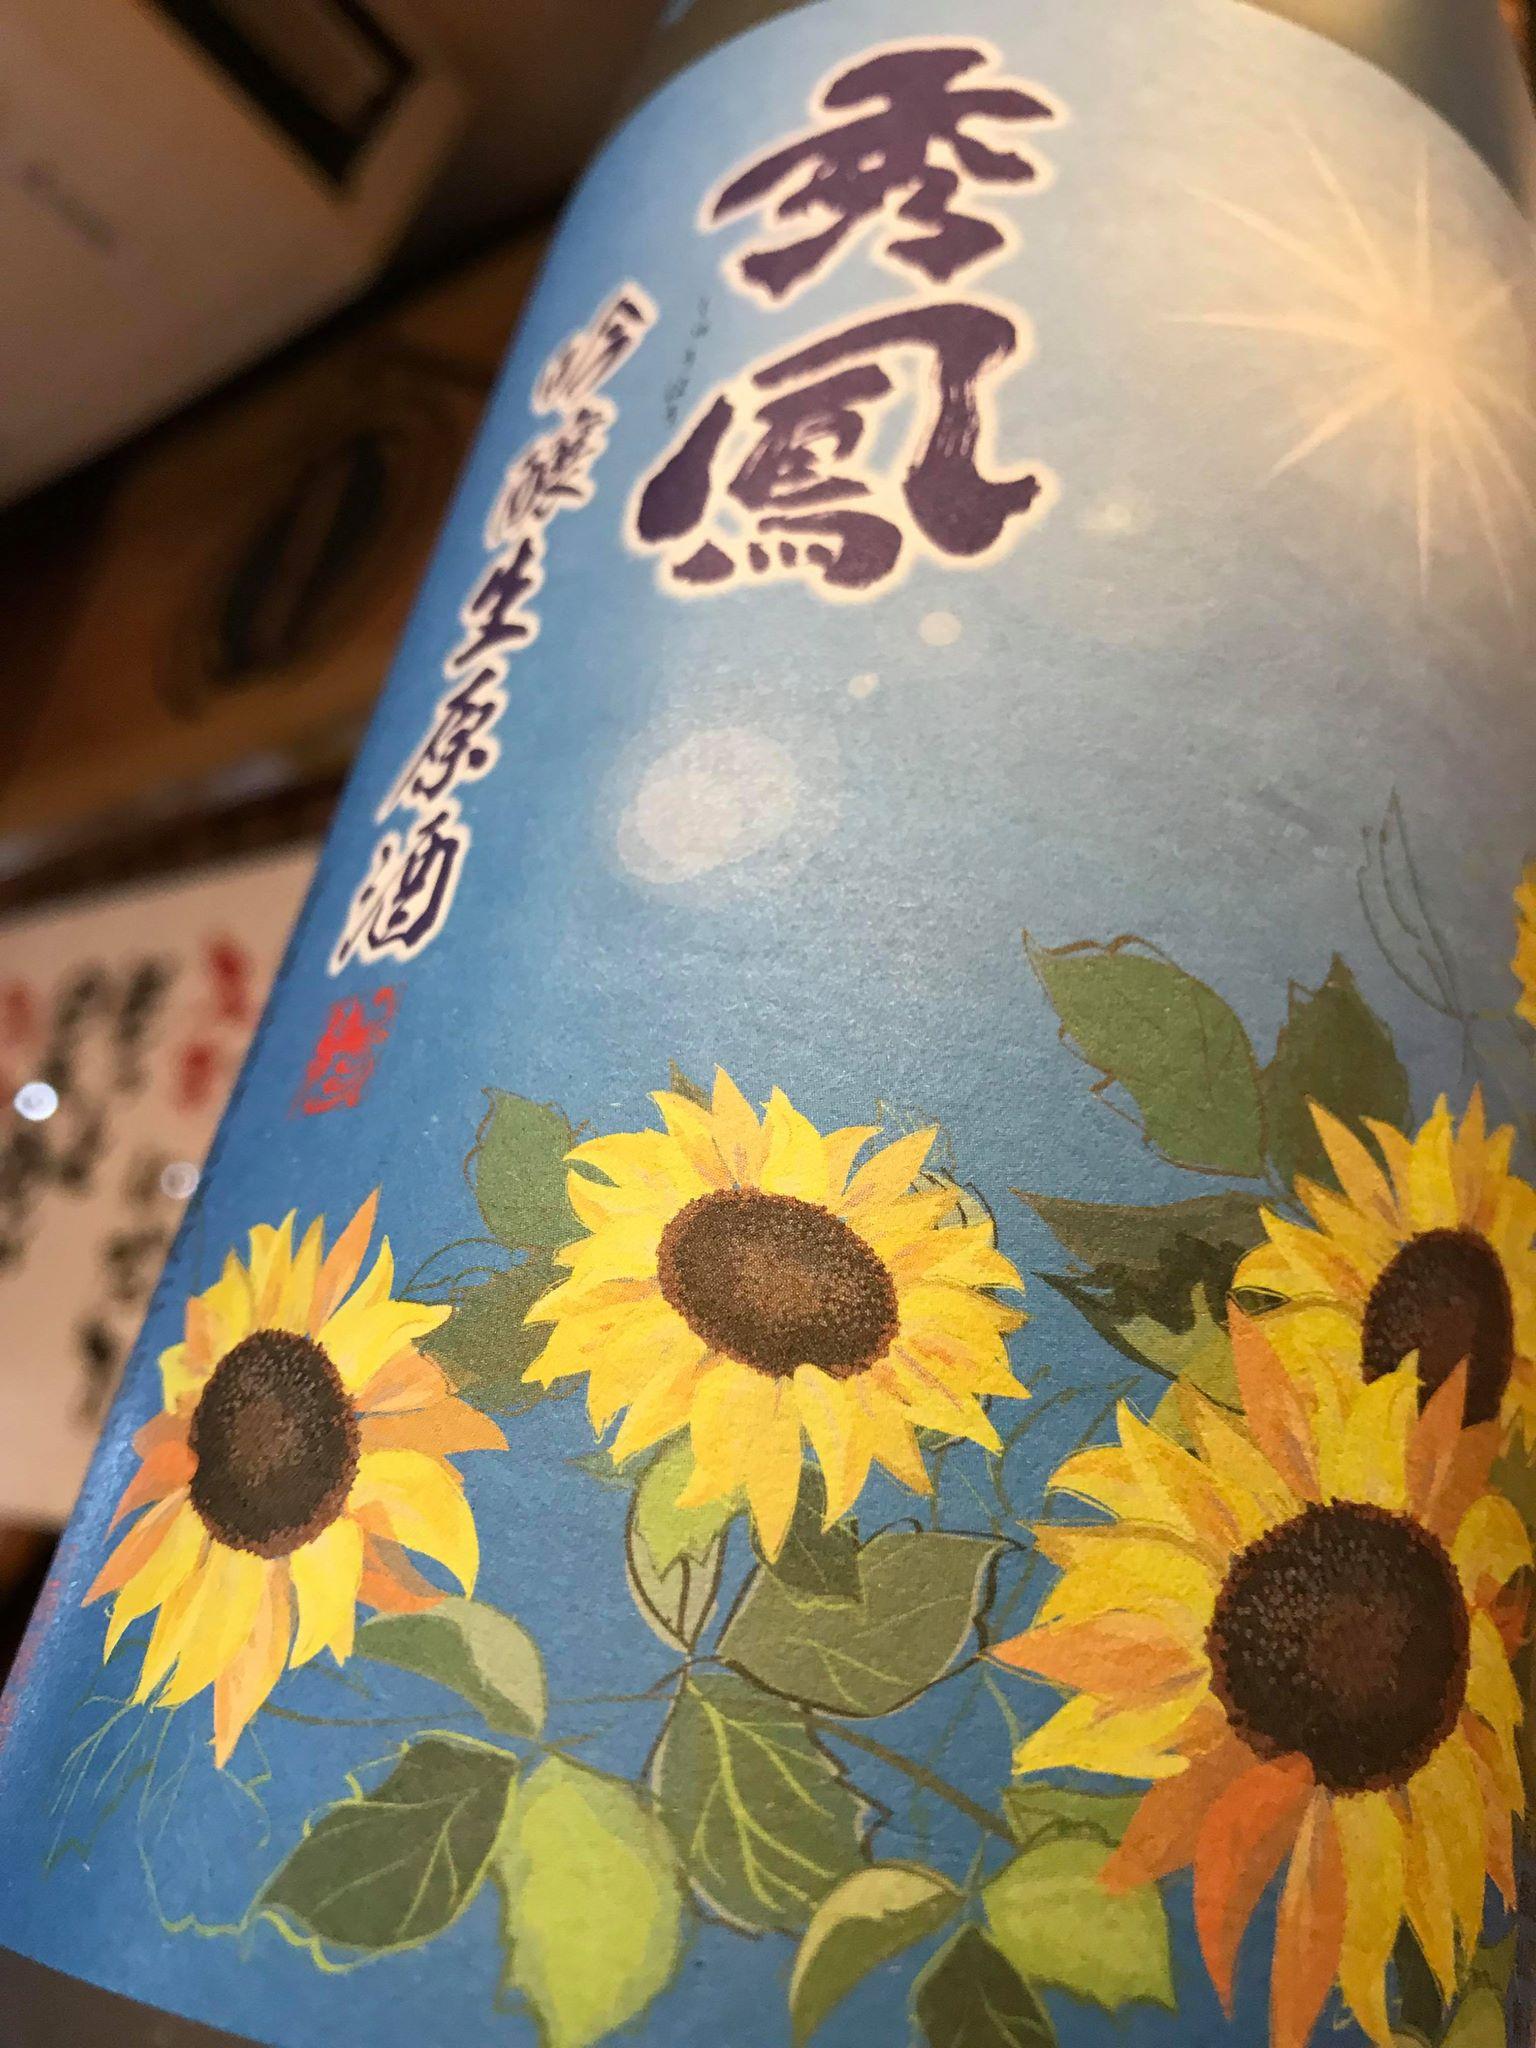 【日本酒】秀鳳 夏吟醸 超辛口生原酒 向日葵SUMMER 出羽きらり50 限定 29BY_e0173738_1545658.jpg